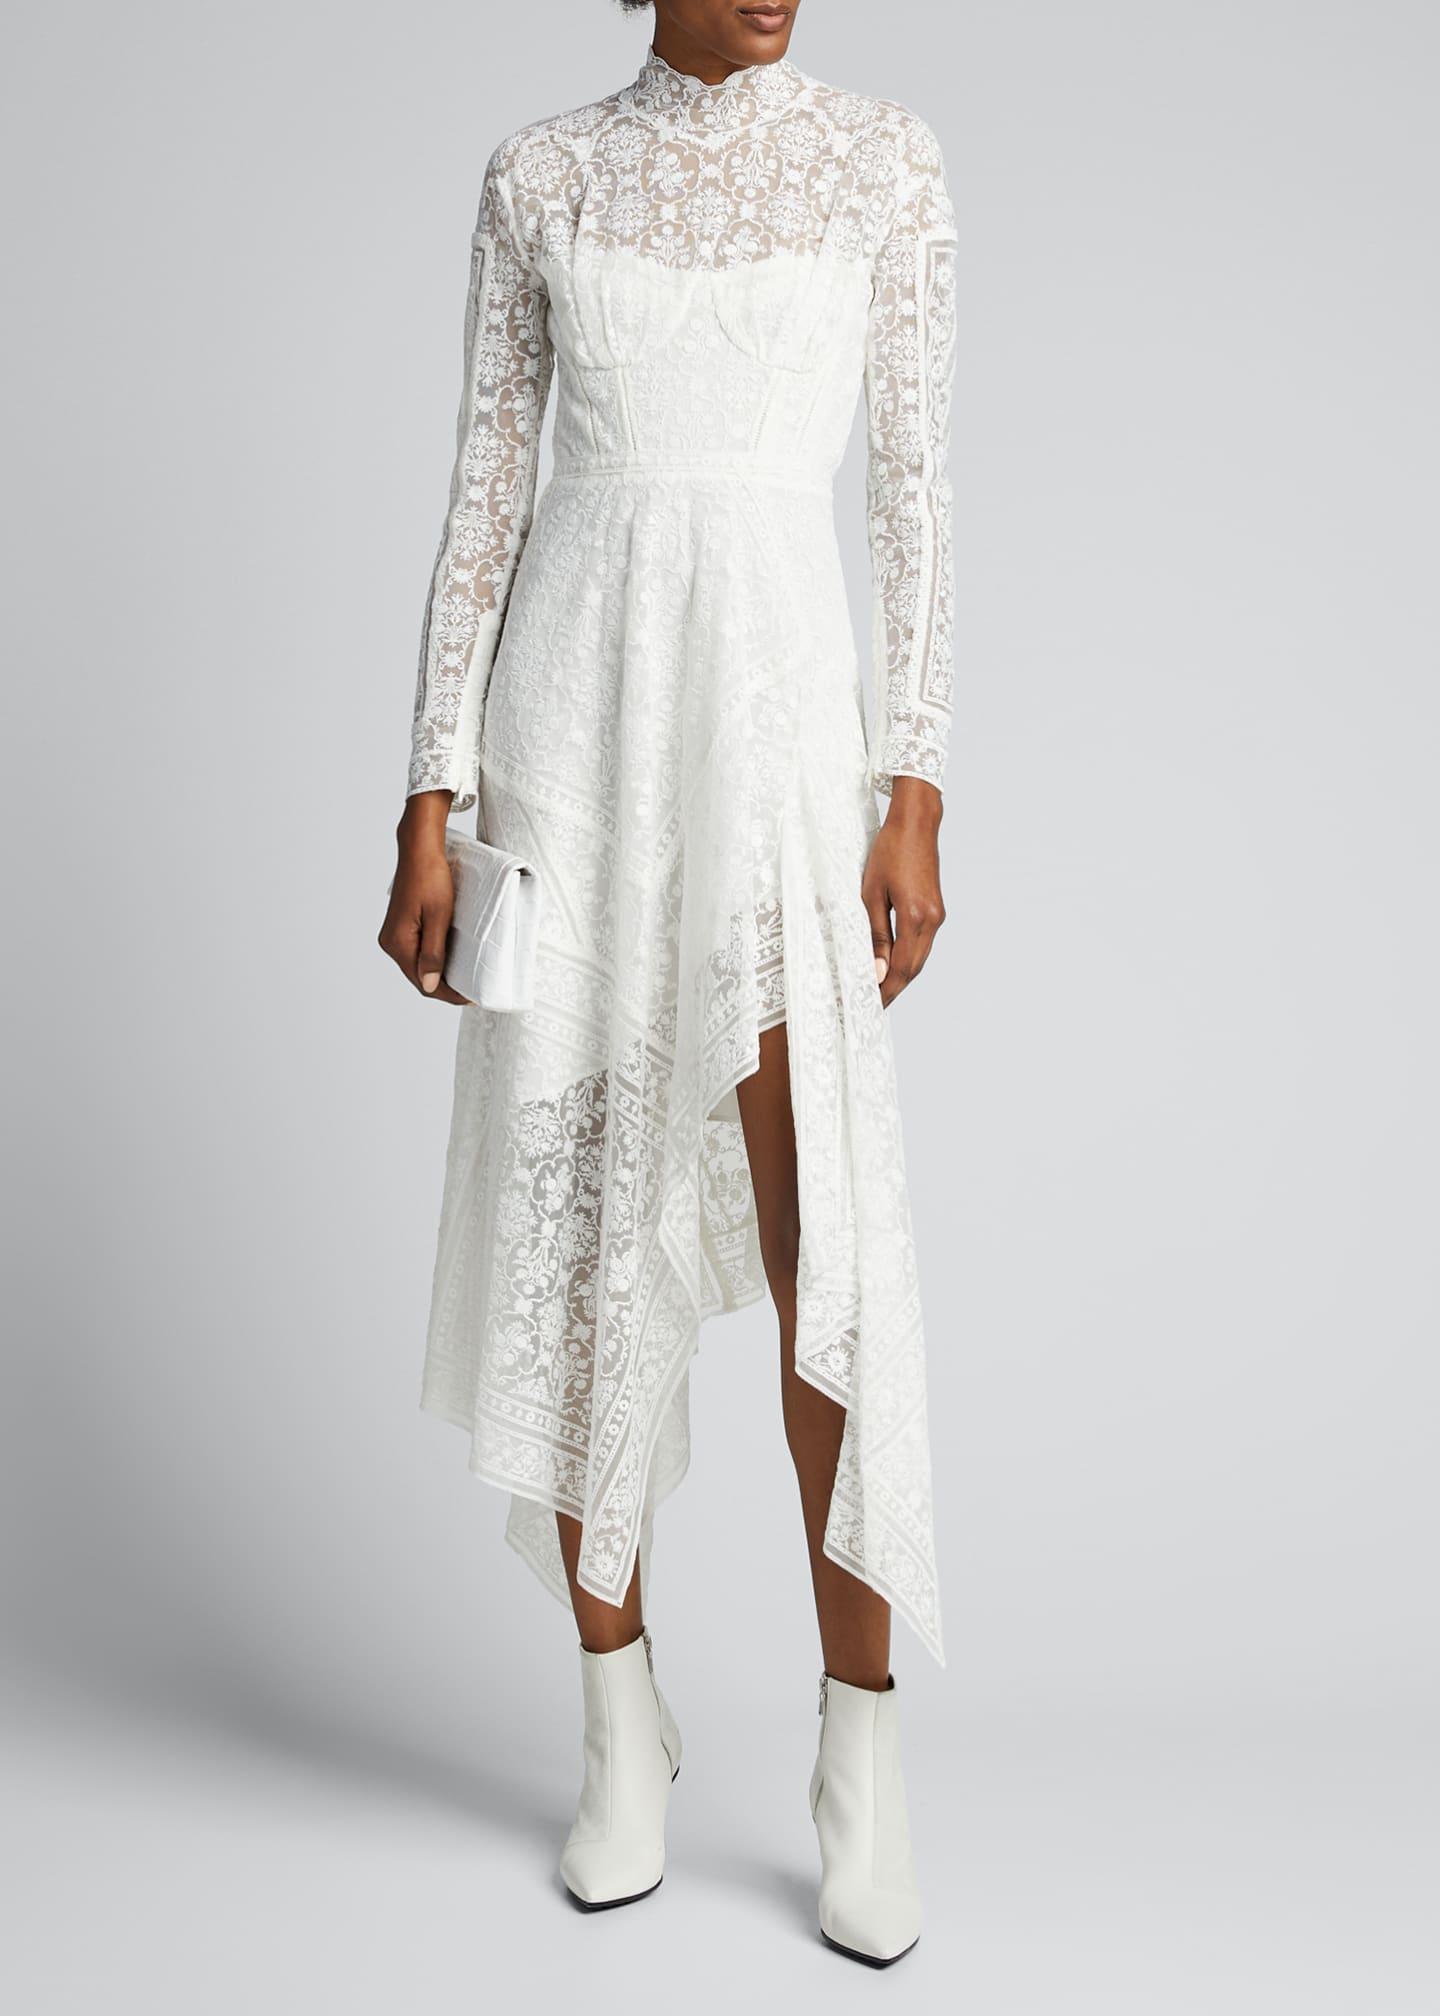 Jonathan Simkhai Scarf Embroidered Handkerchief Bustier Dress